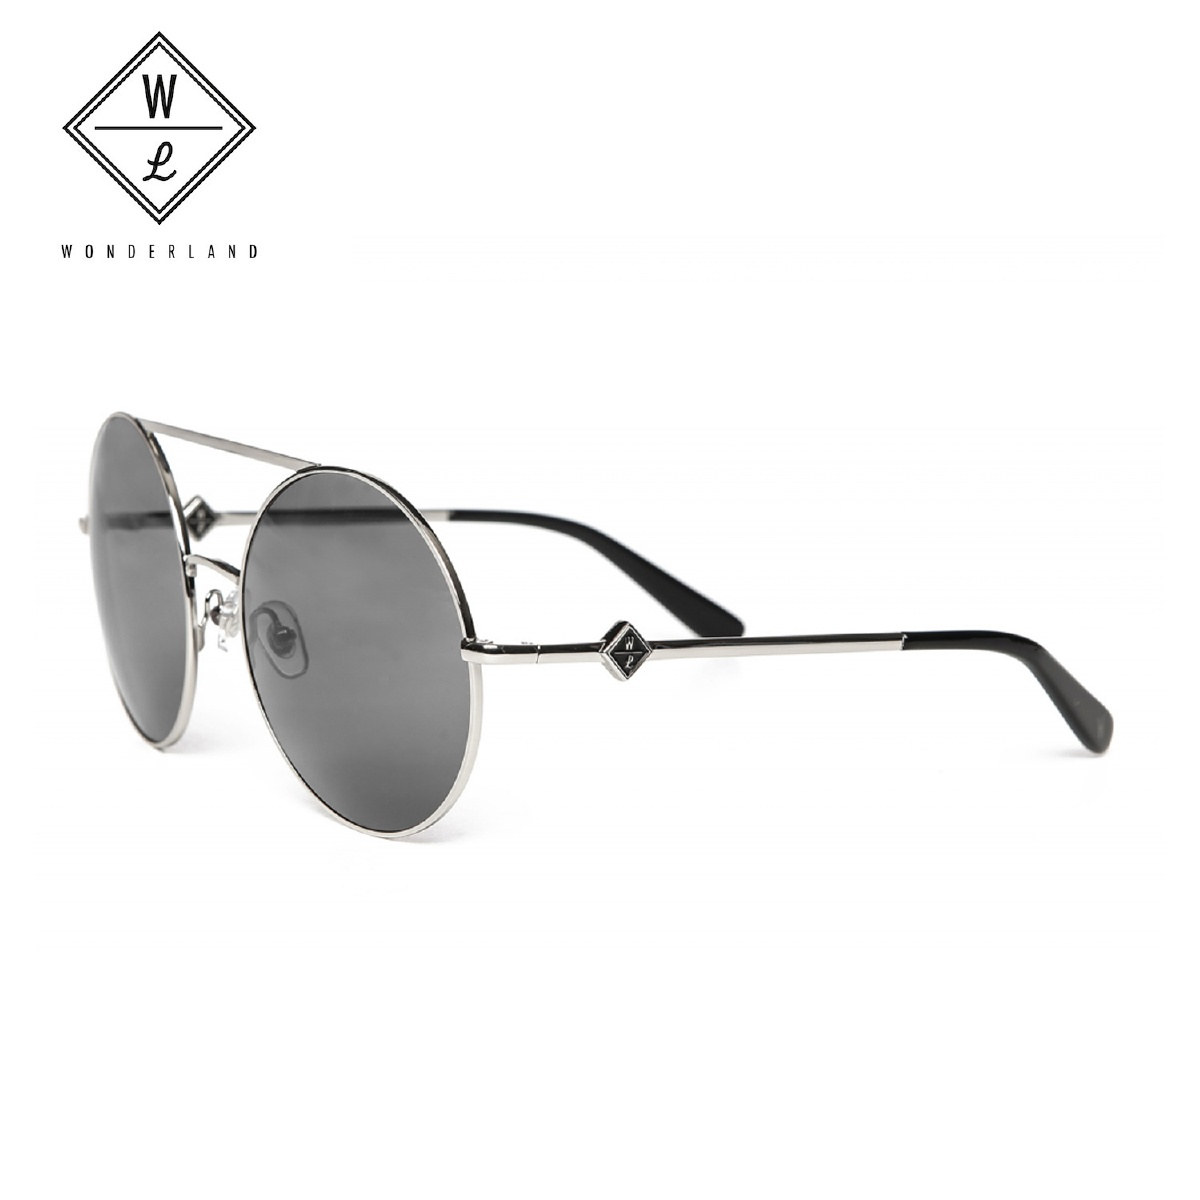 WONDERLAND ワンダーランド サングラス BLYTHE Silver Metal&Gray CZ ブライス メンズ レディース ラウンド型 UVカット アイウェア カラーレンズ ブラック グレー blythe02